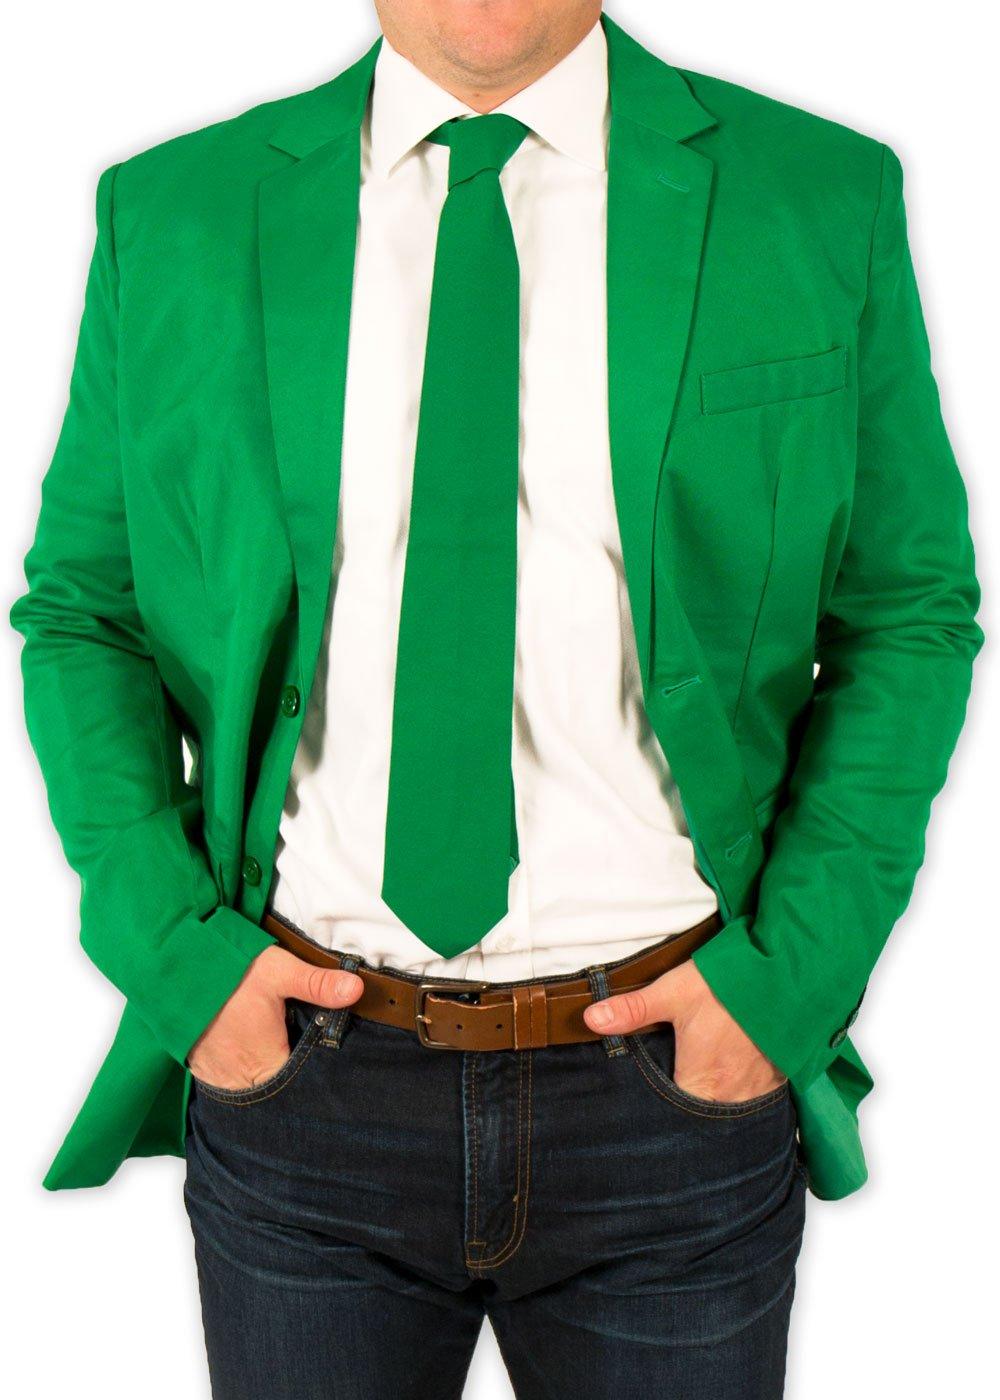 Festified Men's Classic Party Suit Coat and Tie In Green (50)